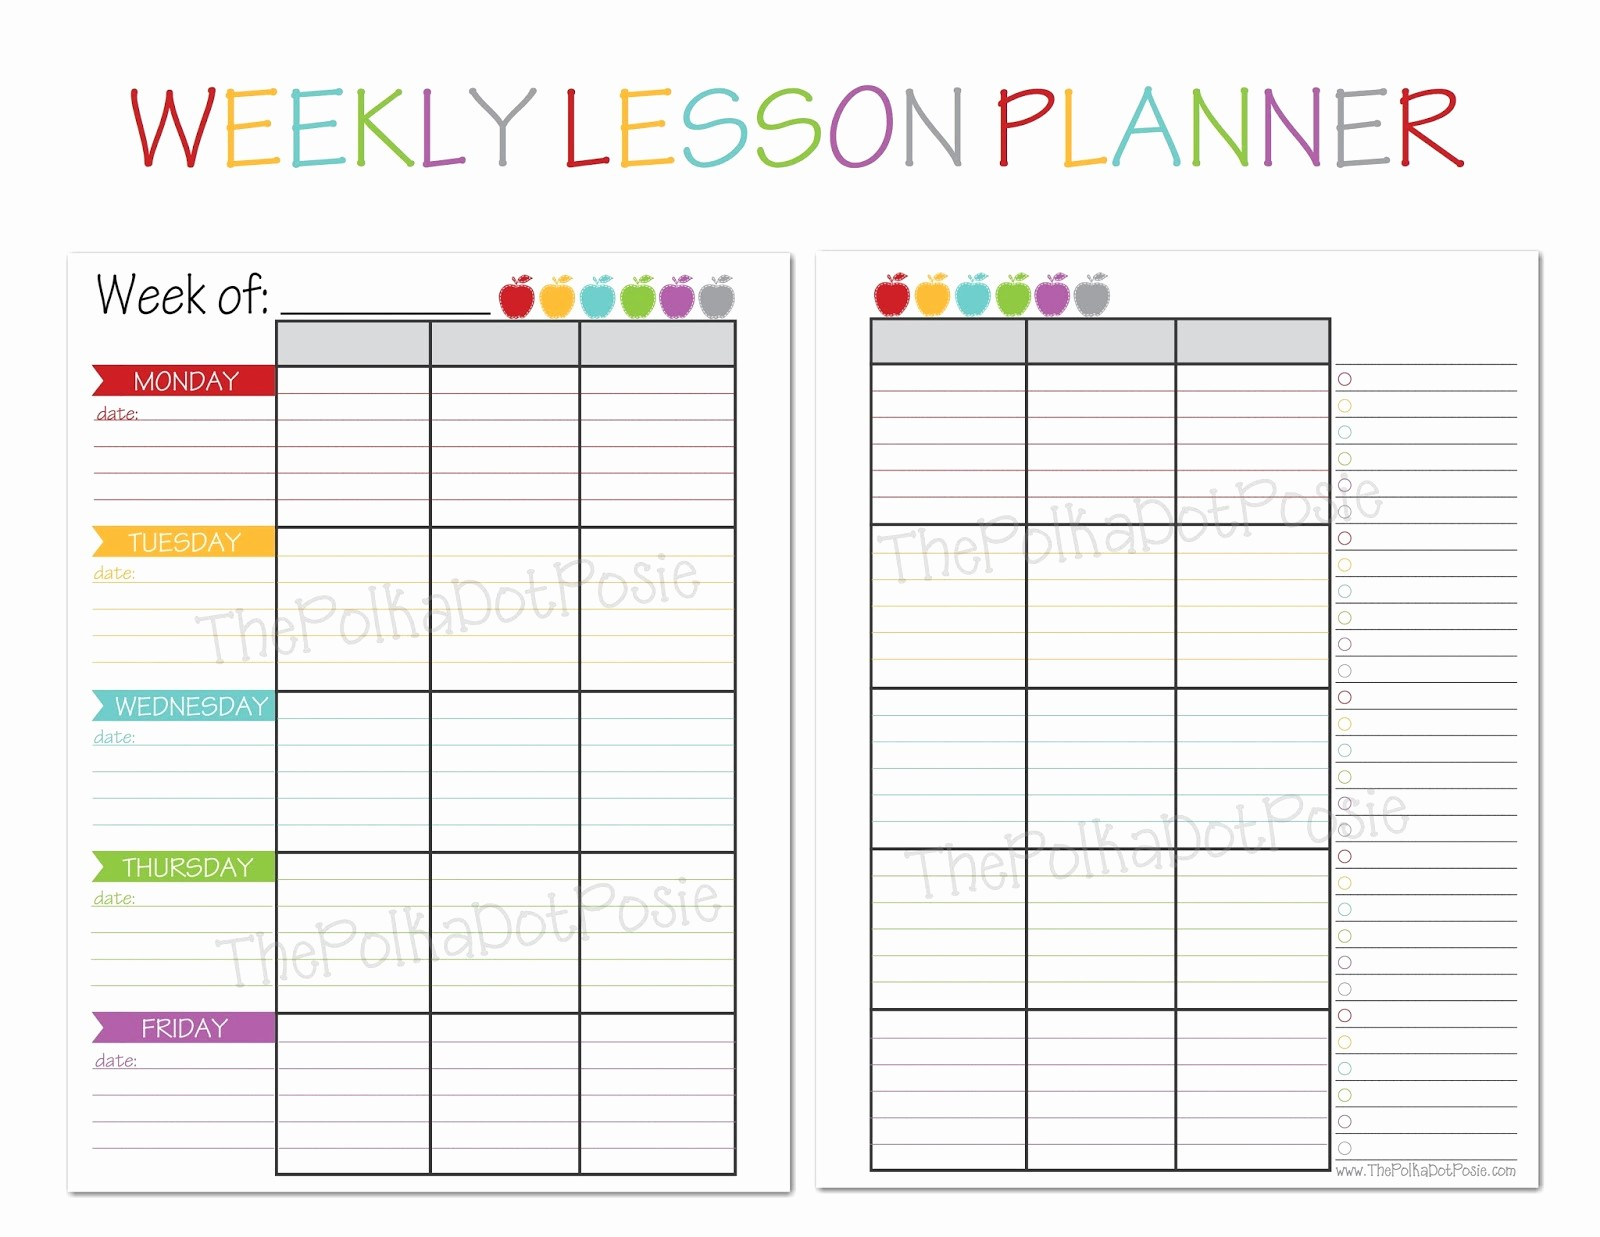 Weekly Planner Template for Teachers Inspirational the Polka Dot Posie New Teacher & Homeschool Planners